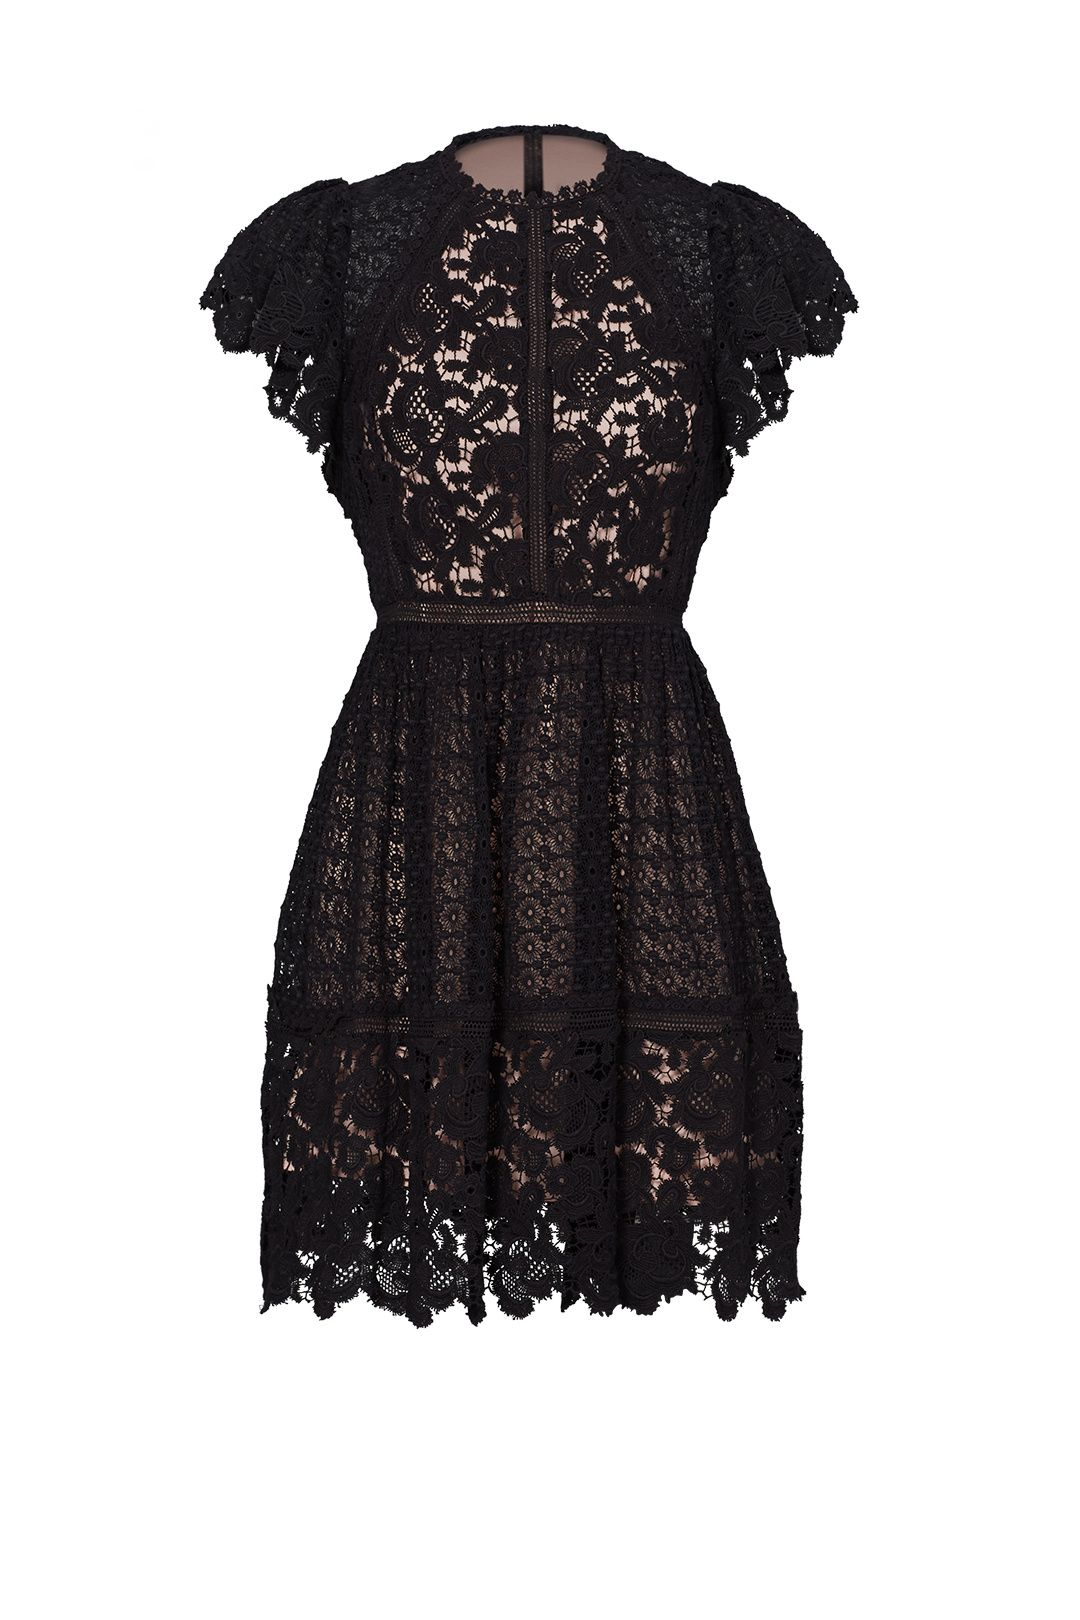 7535e7e6 Rebecca Taylor Black Lace Mix Dress | Style File | Dresses, Lace ...